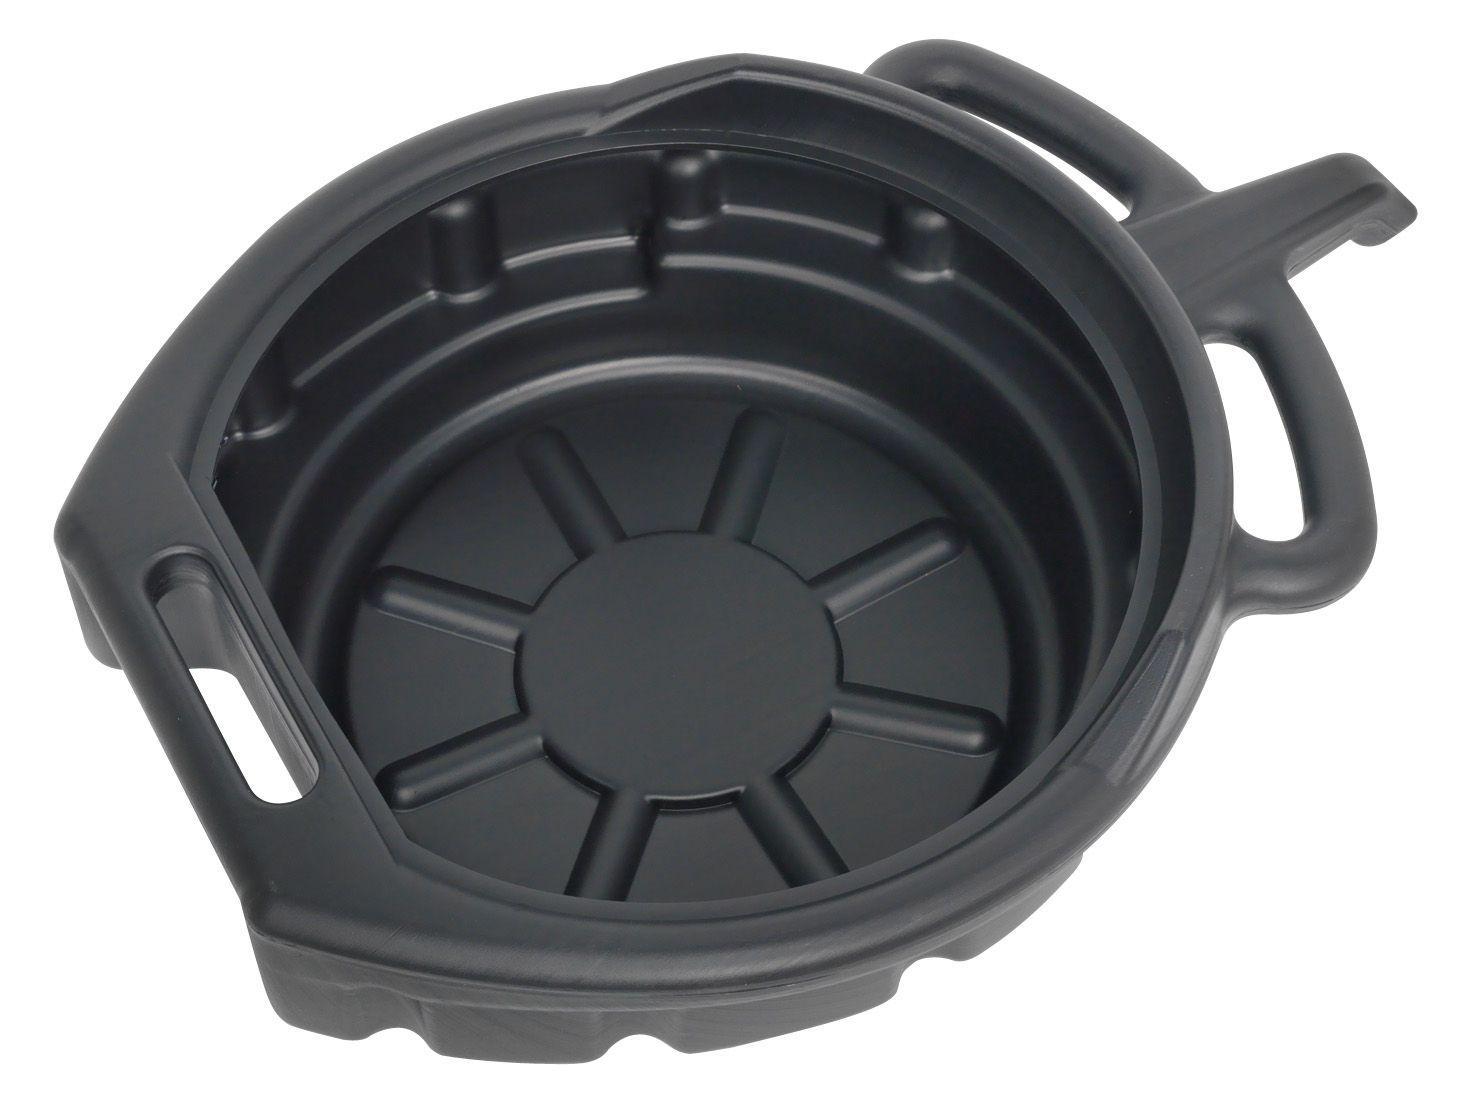 Sealey Oil/Fluid Drain Pan 7.6L